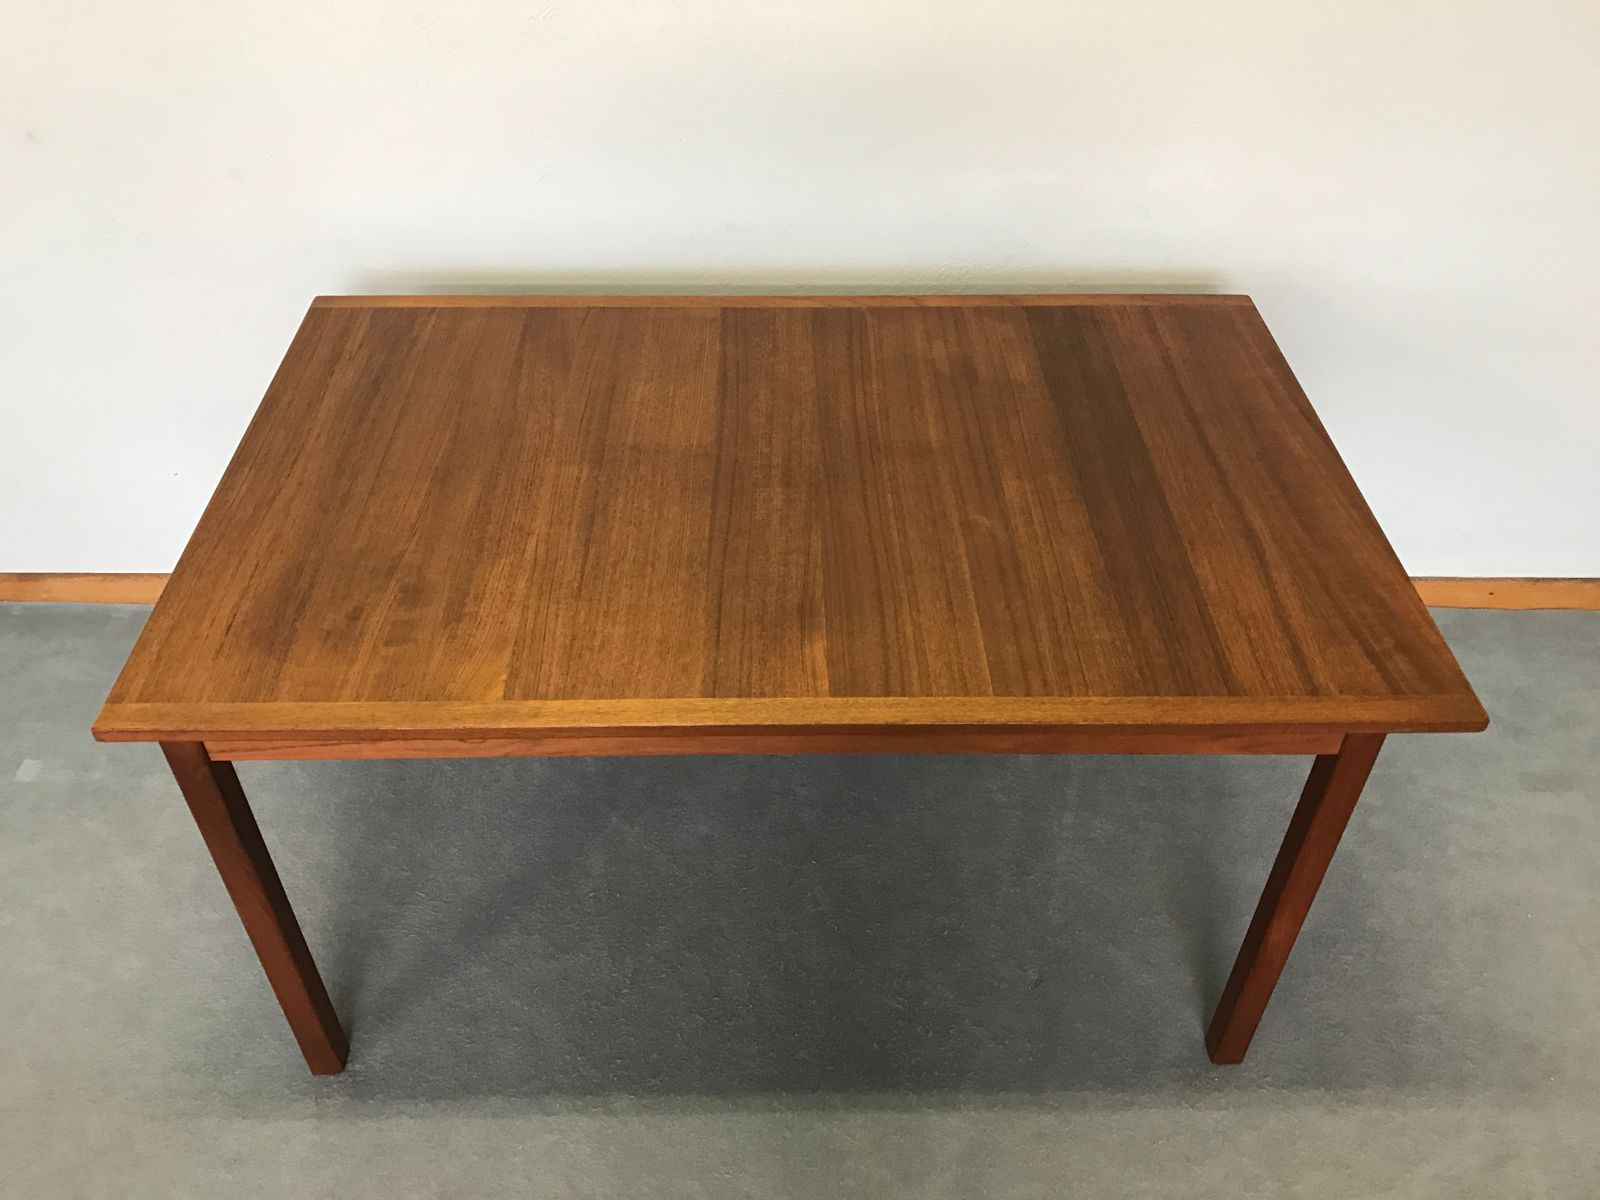 table de salle manger vintage scandinave en teck par nils jonsson en vente sur pamono. Black Bedroom Furniture Sets. Home Design Ideas